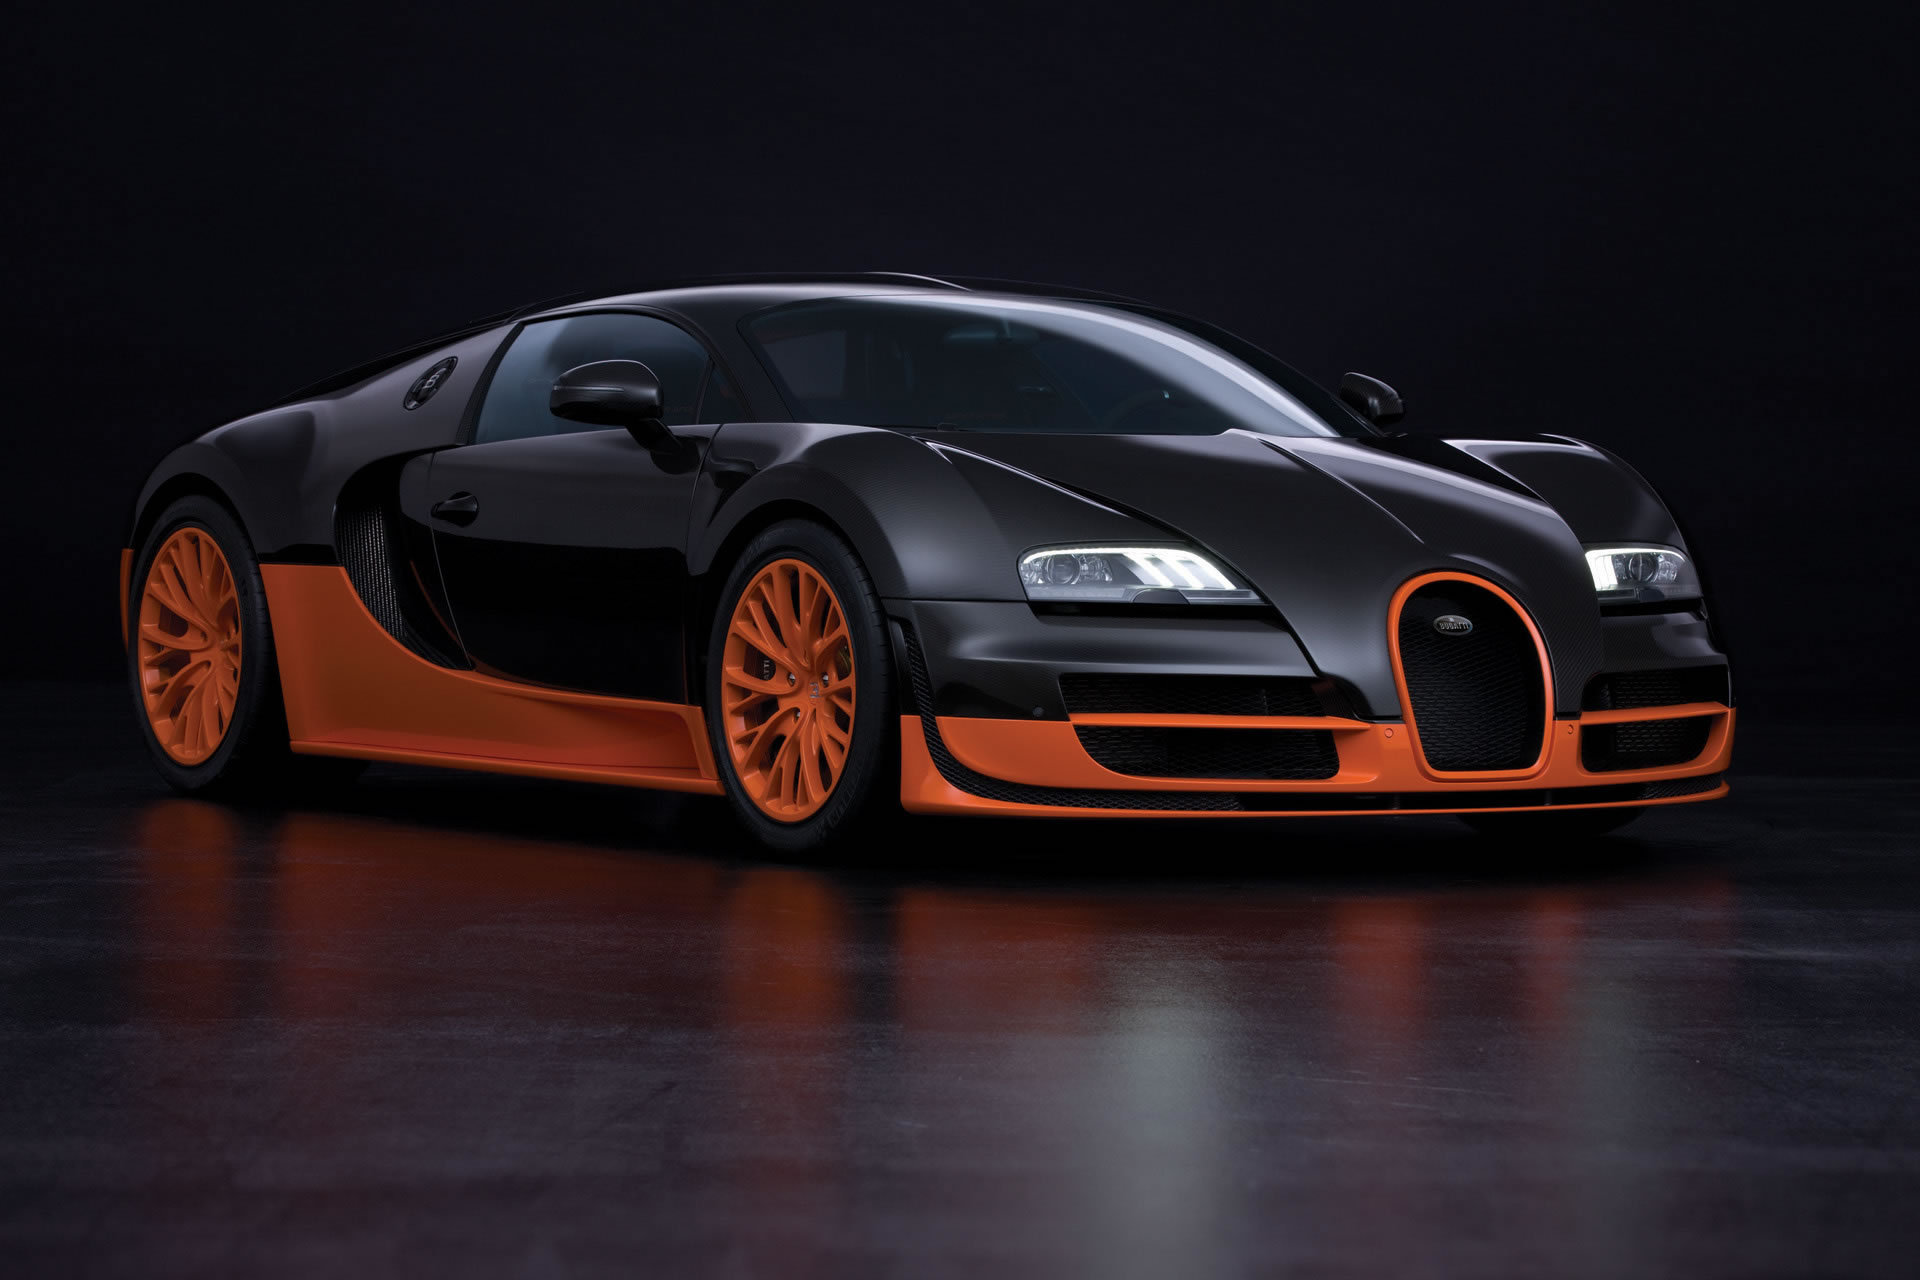 1170898_1358691216901_full Mesmerizing Bugatti Veyron Nfs Most Wanted Cars Trend